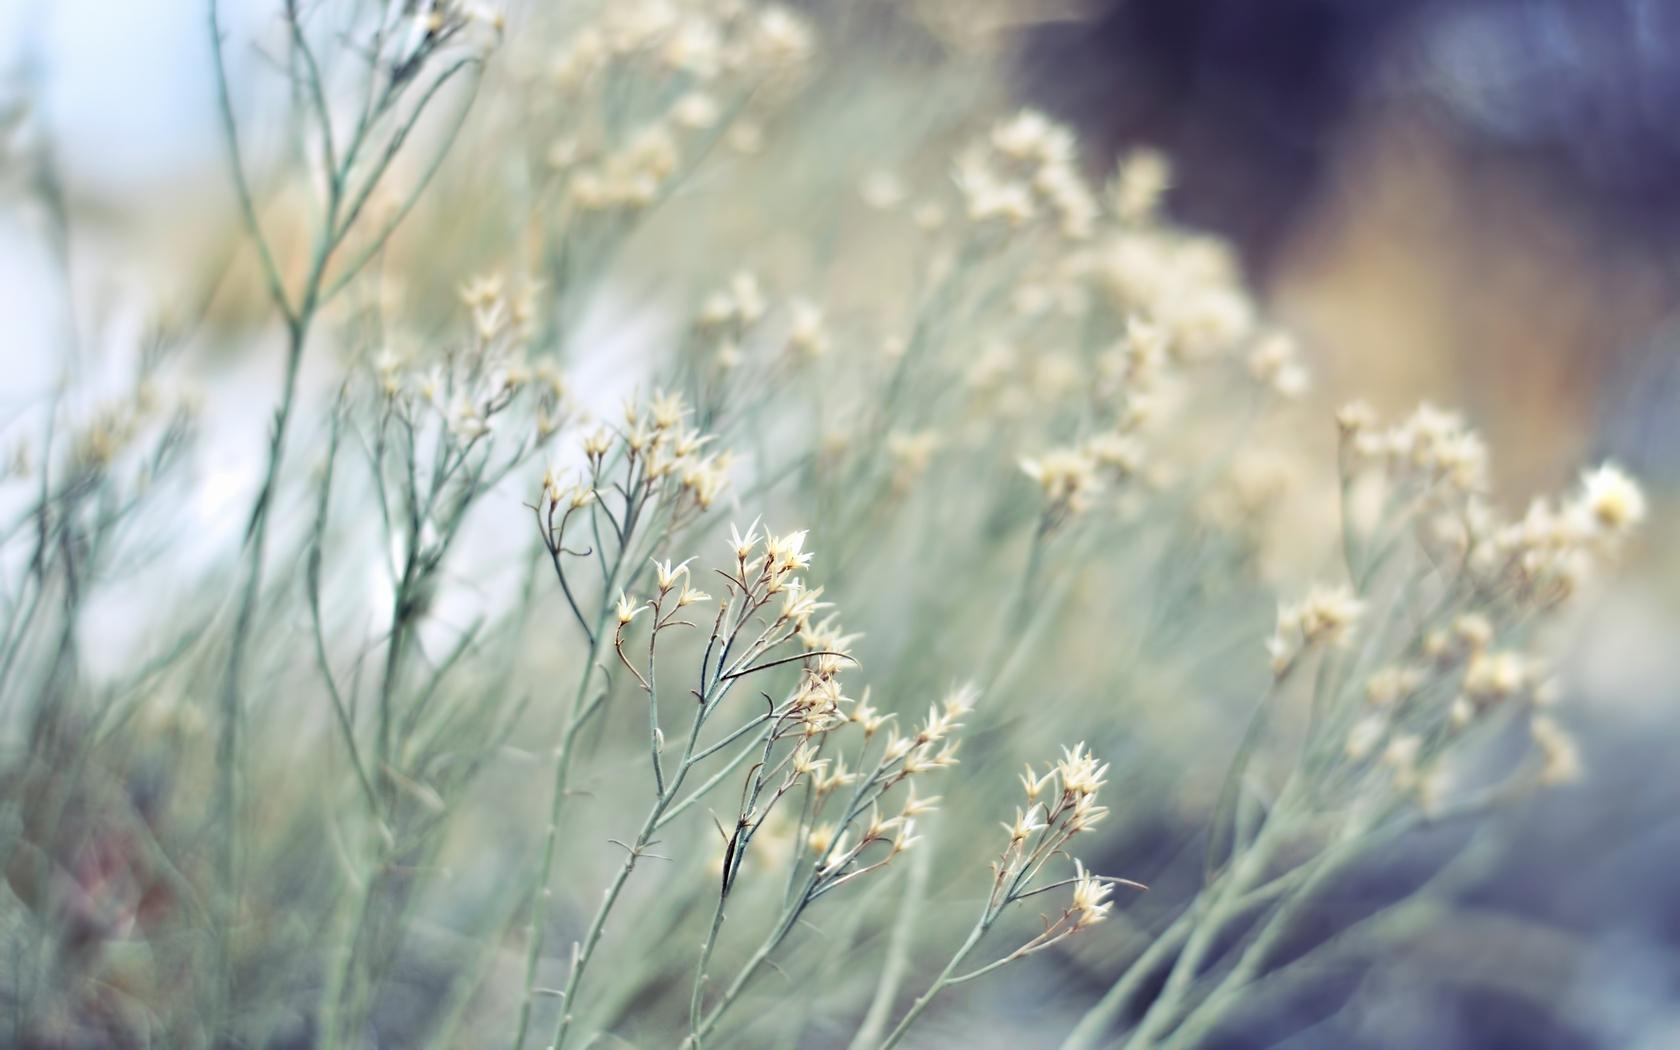 Wallpaper Plants Bushes Herbs Dry Flower Gray